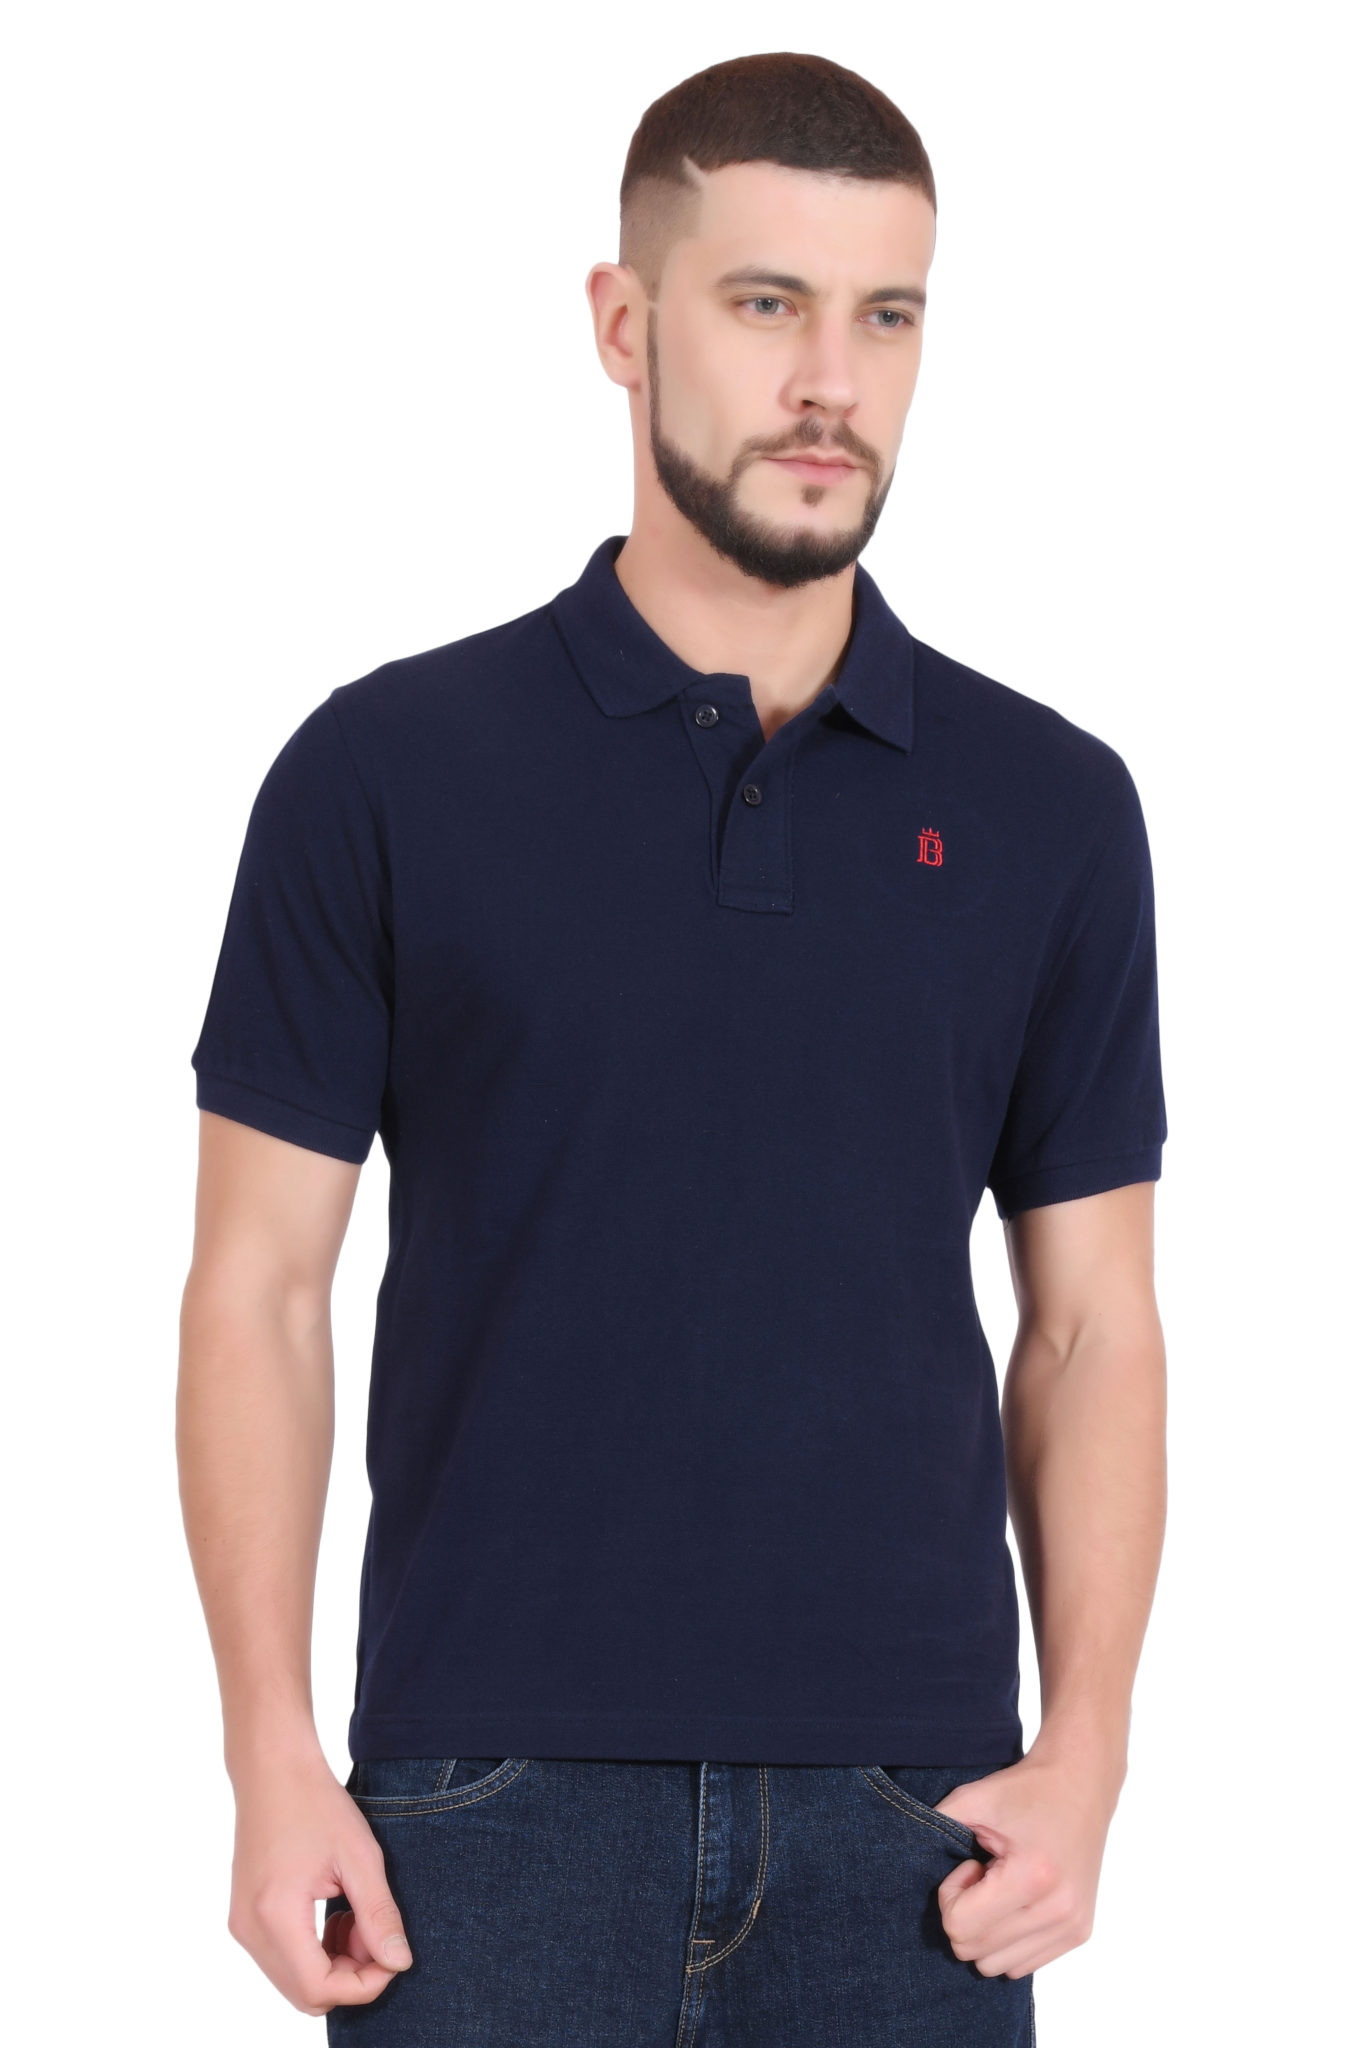 Plain Cotton Navy Blue Polo T shirt for Men - by BlueAura ...